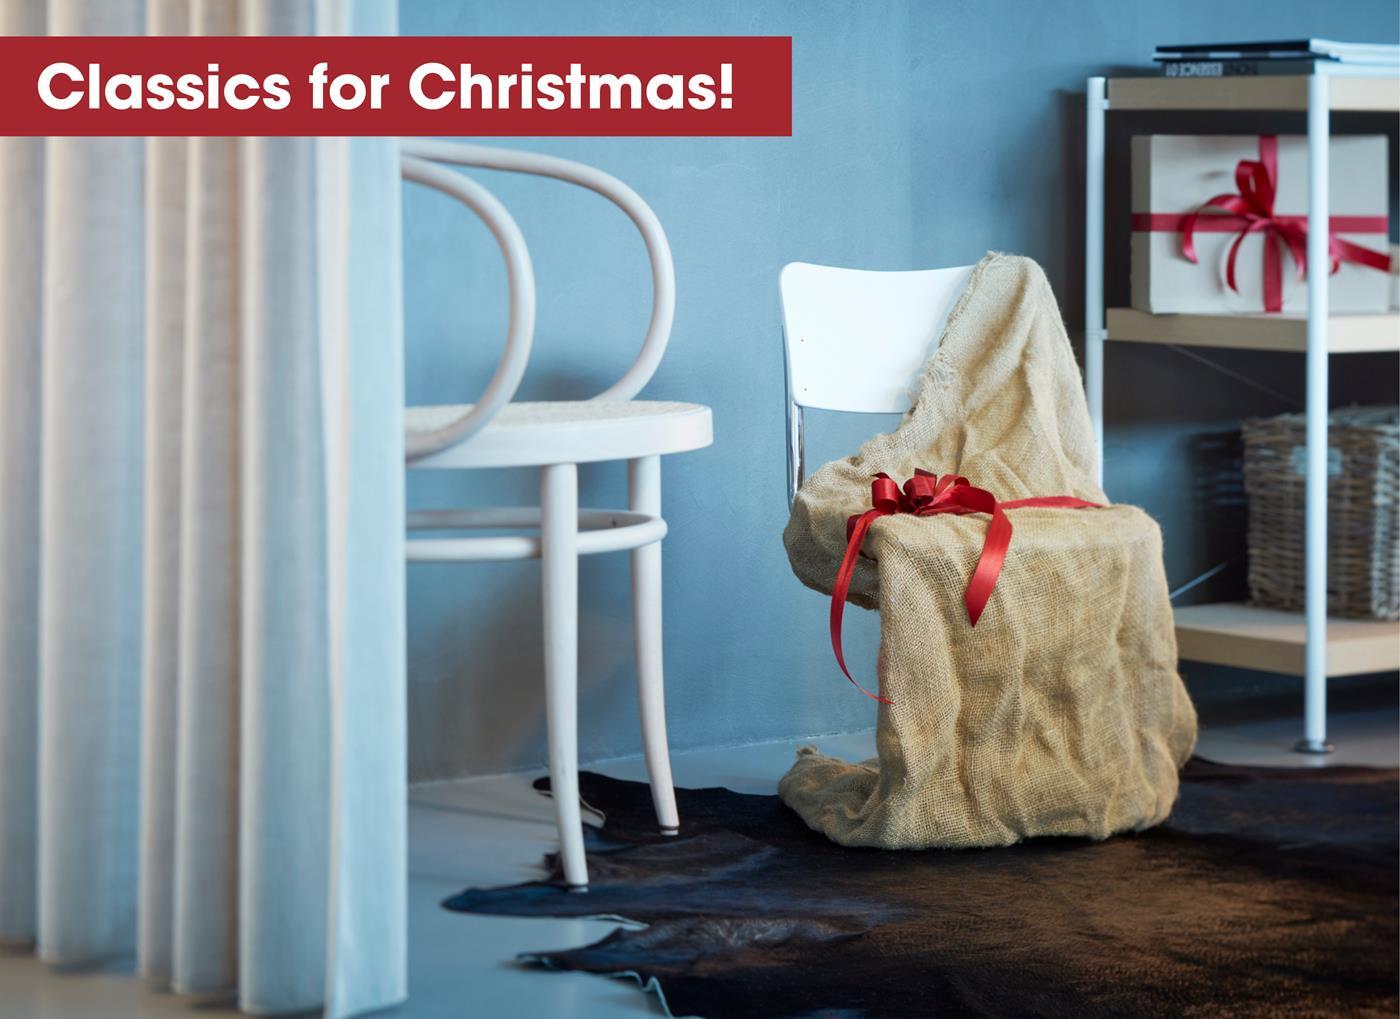 thonet_classicsforchristmasv7-152147